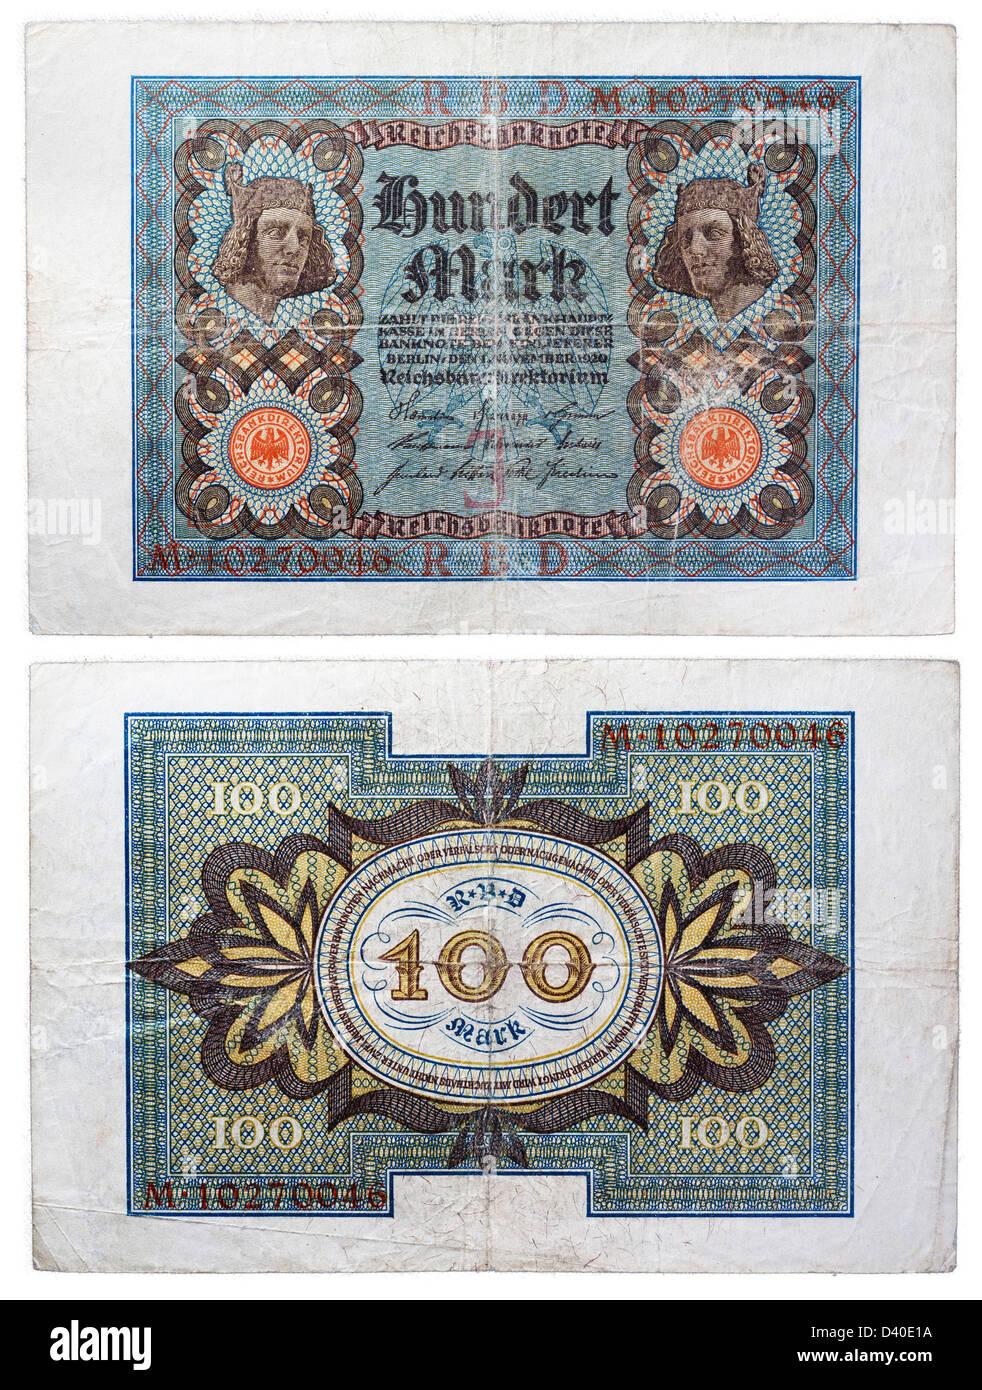 100 Mark banknote, Germany, 1920 Stock Photo